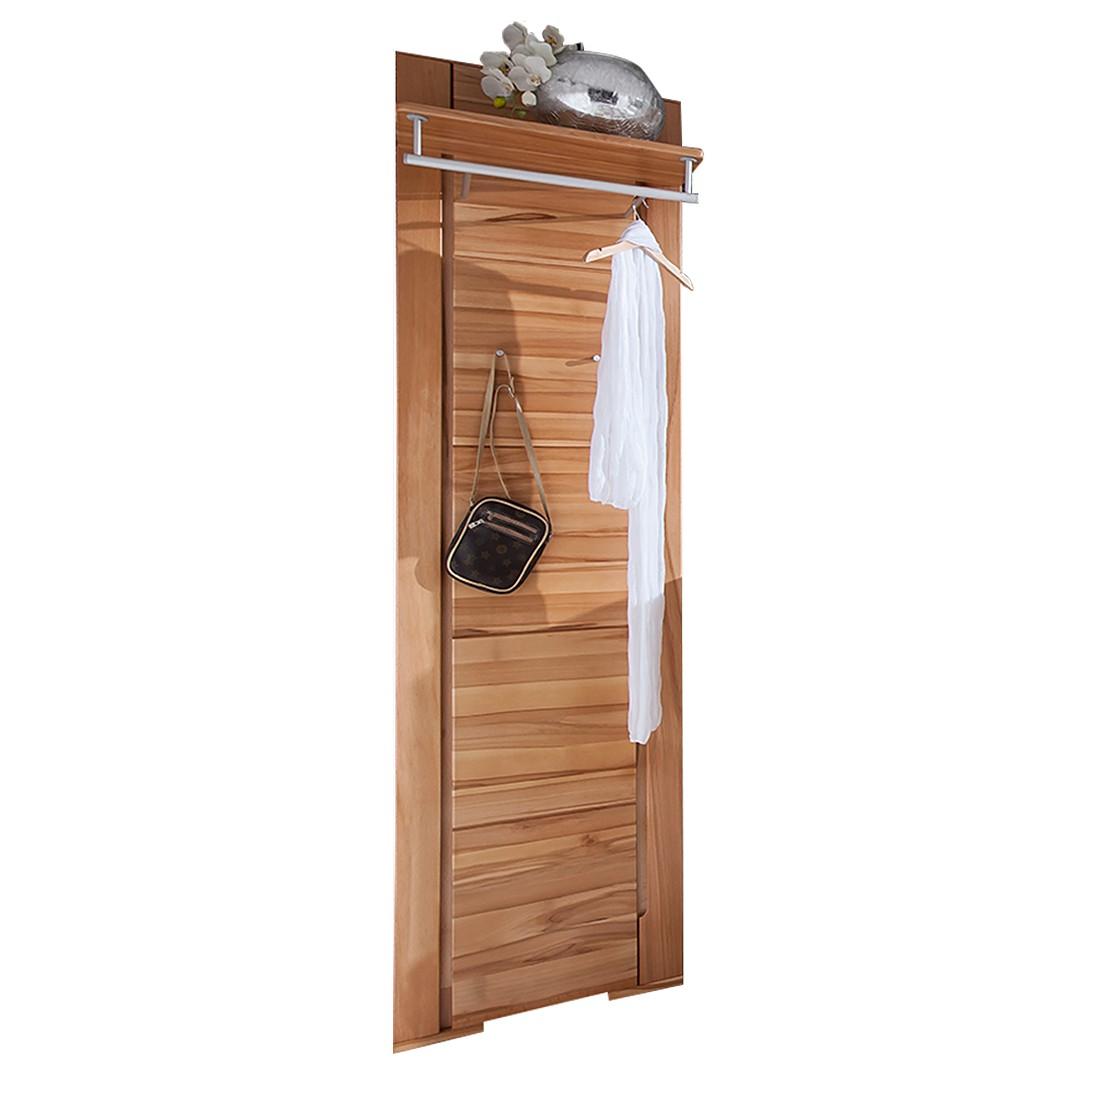 Garderobenpaneele flur diele m bel for Garderobenpaneel schmal